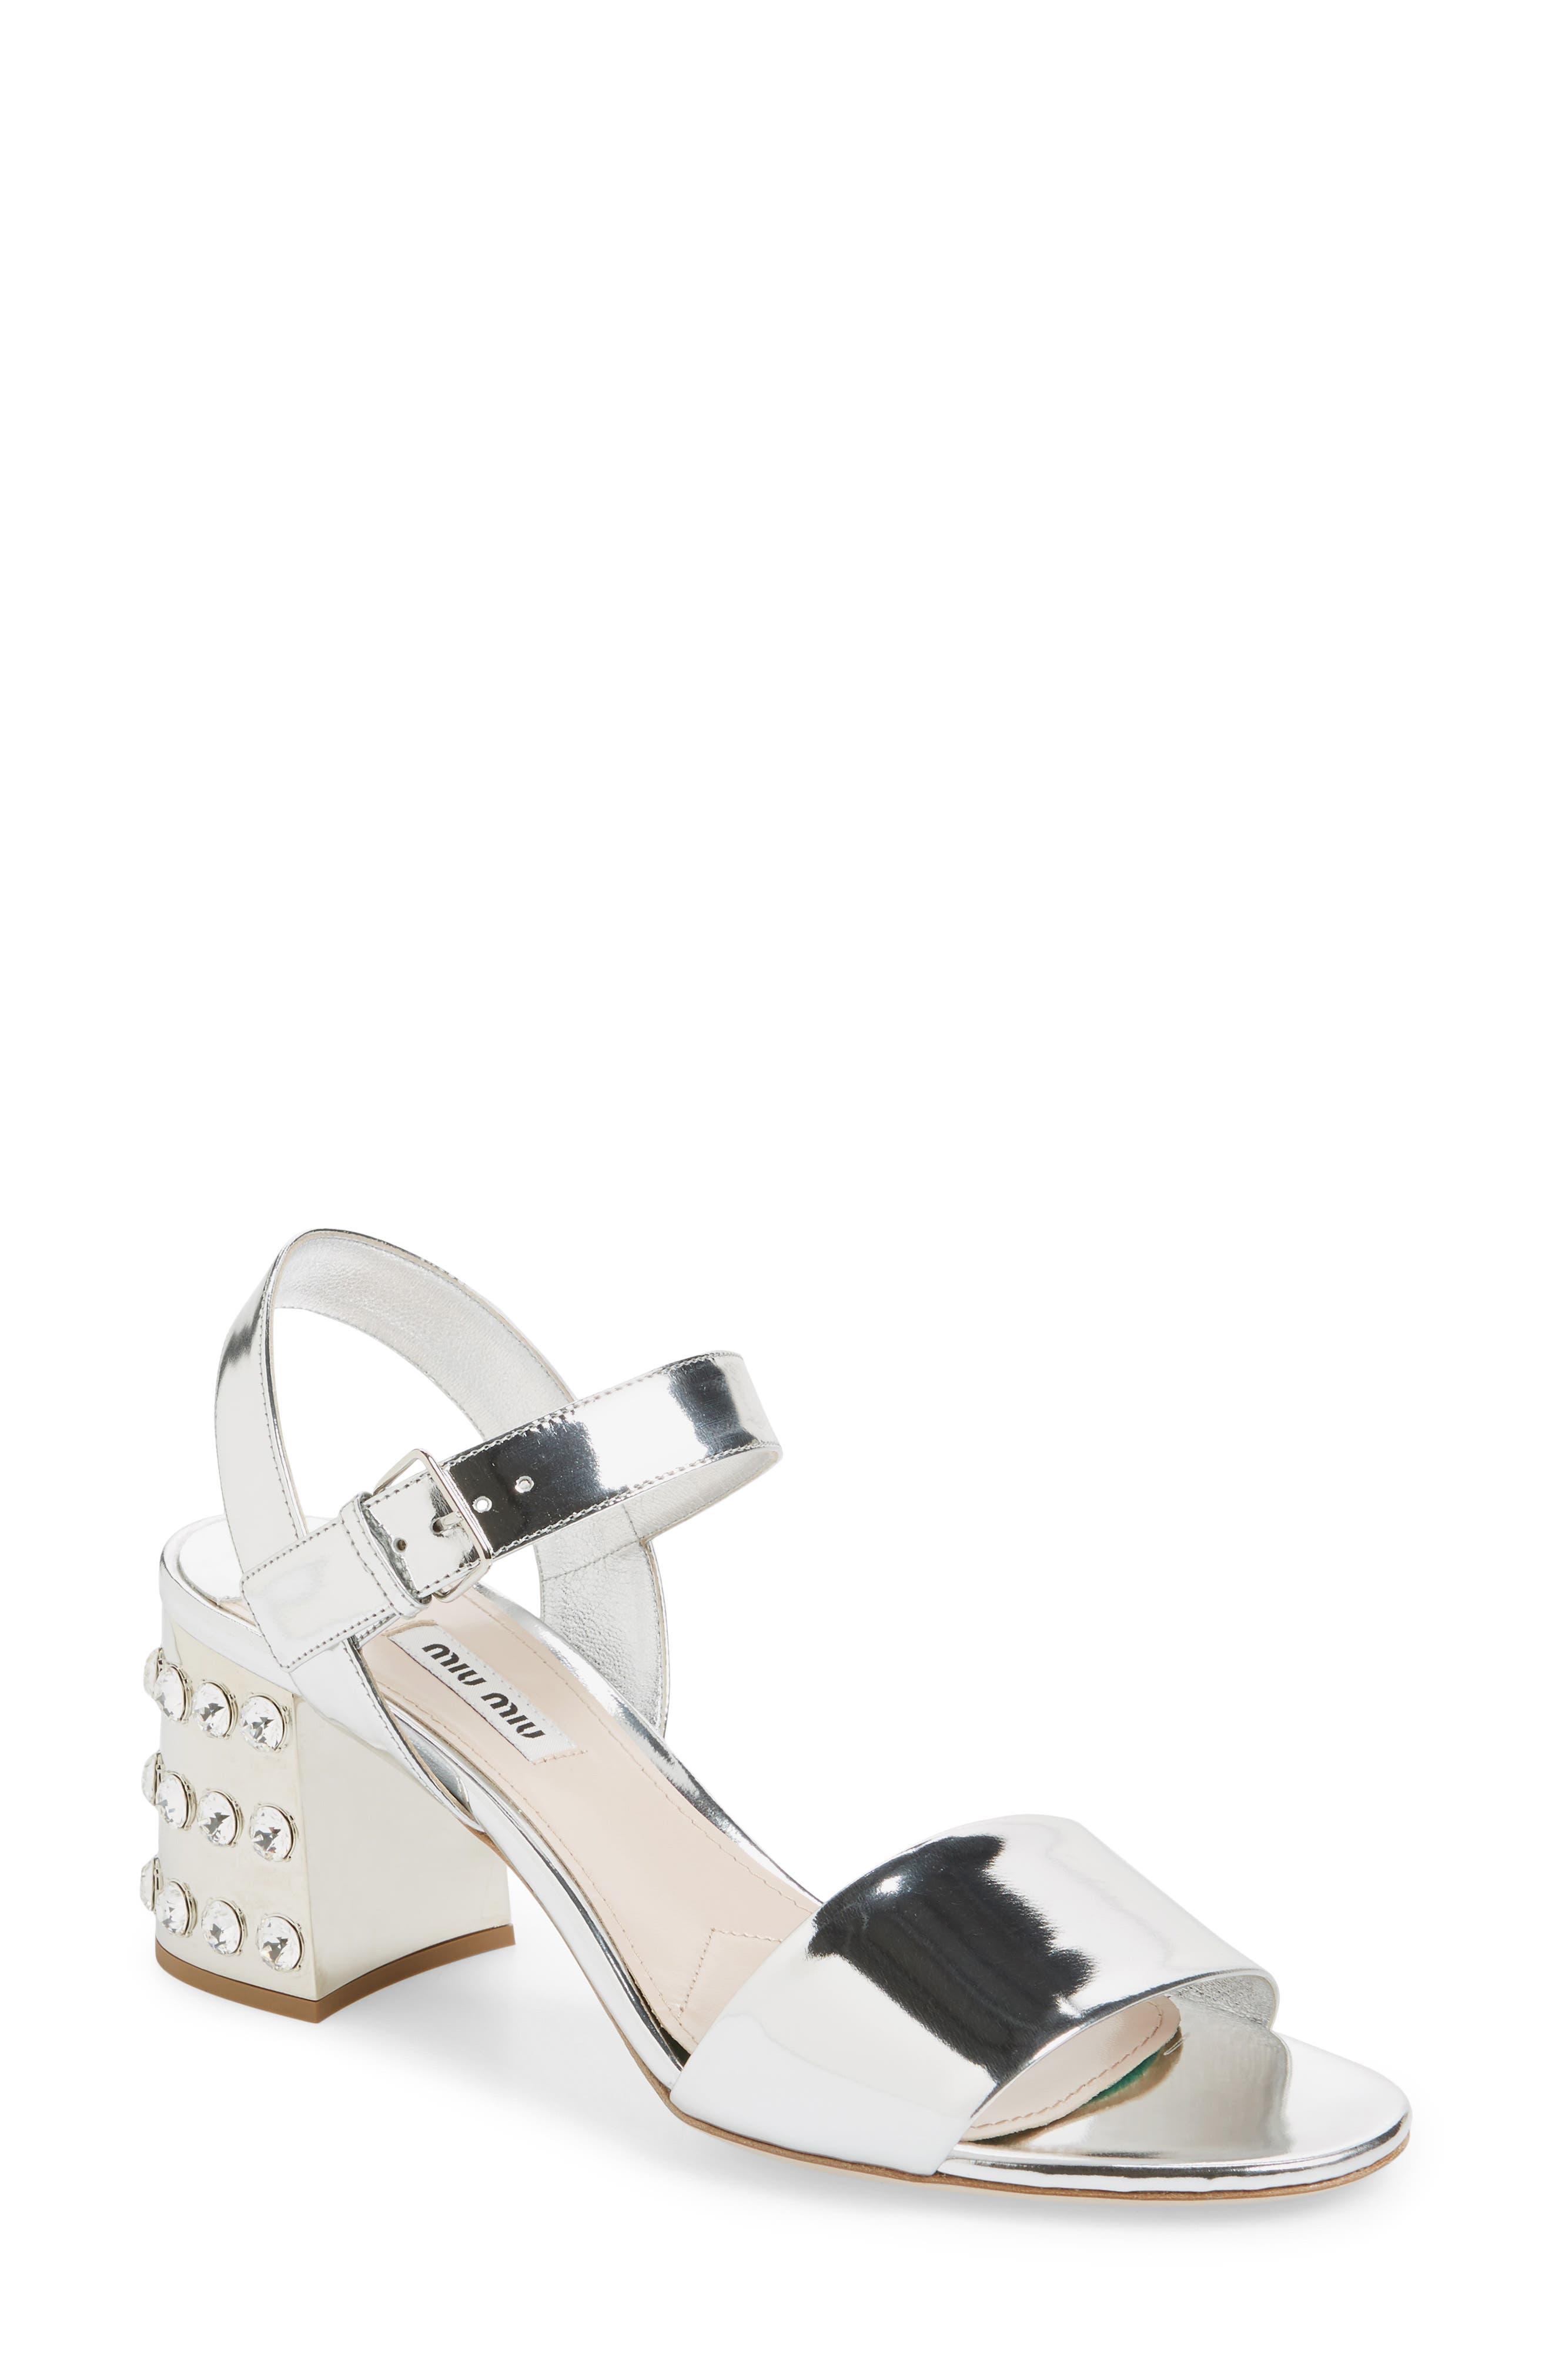 Main Image - Miu Miu Crystal Embellished Block Heel Sandal (Women)